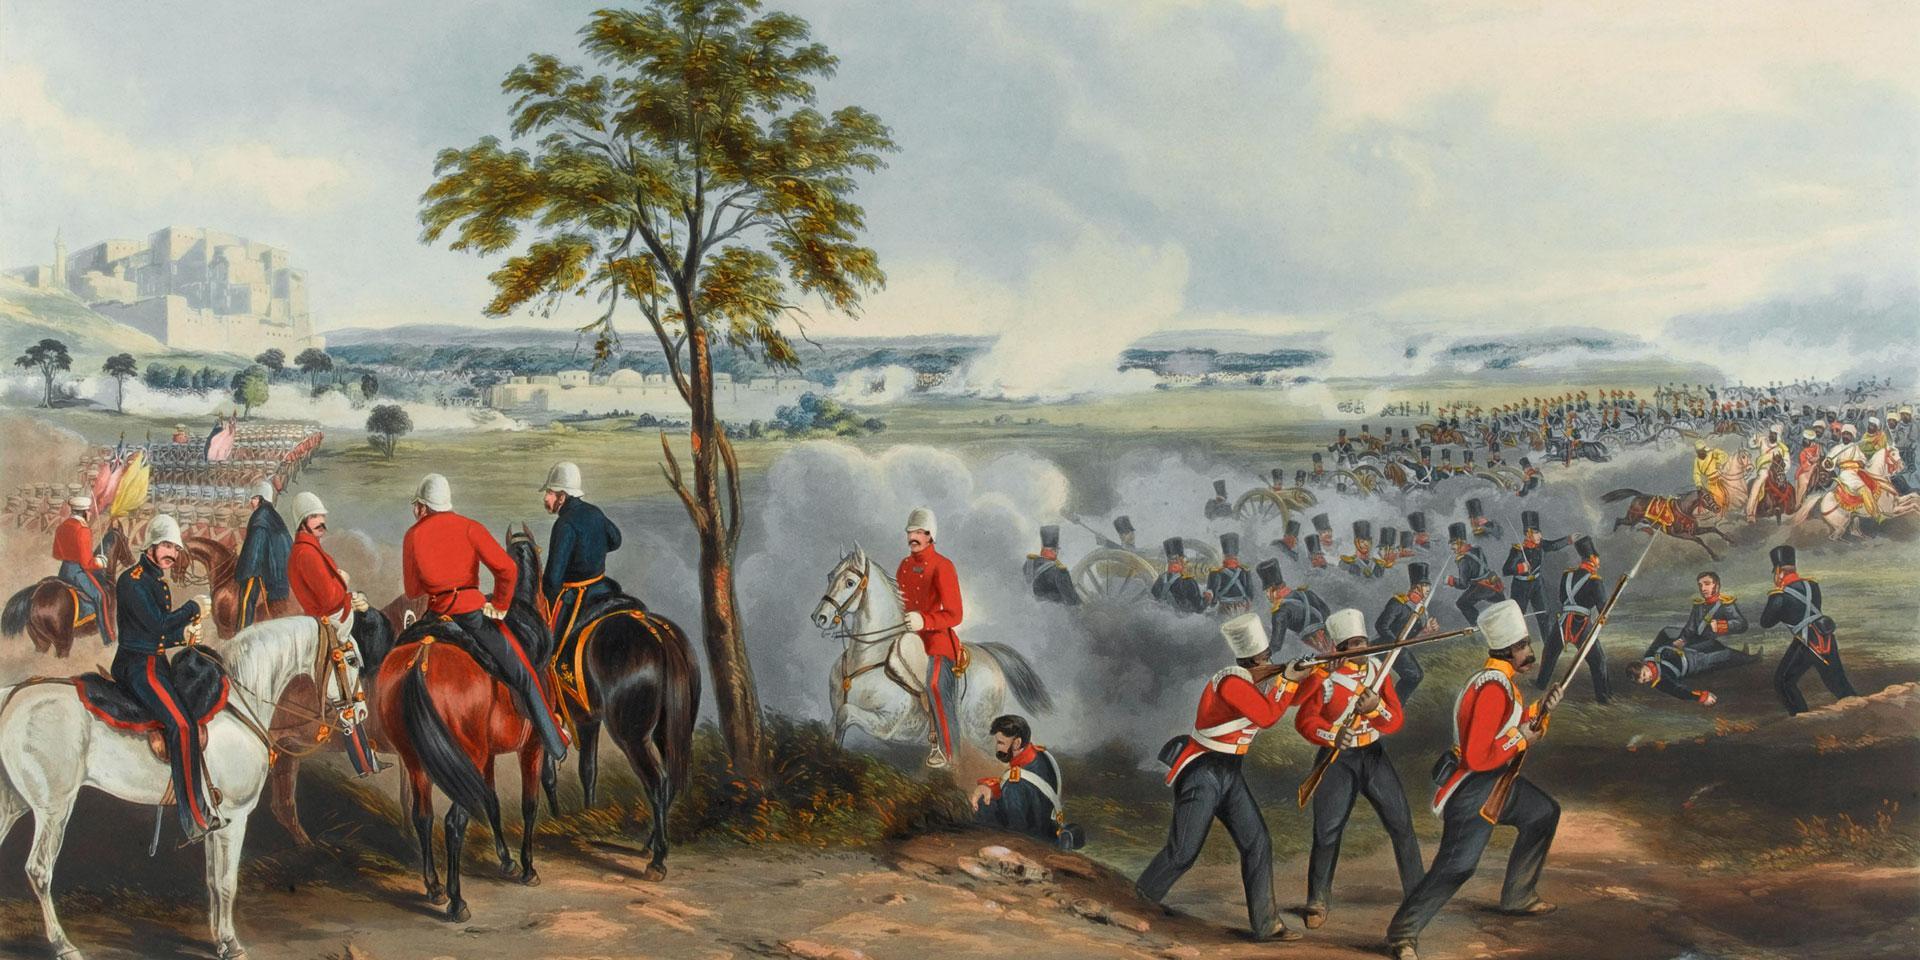 The Battle of Gujerat, 21 February 1849